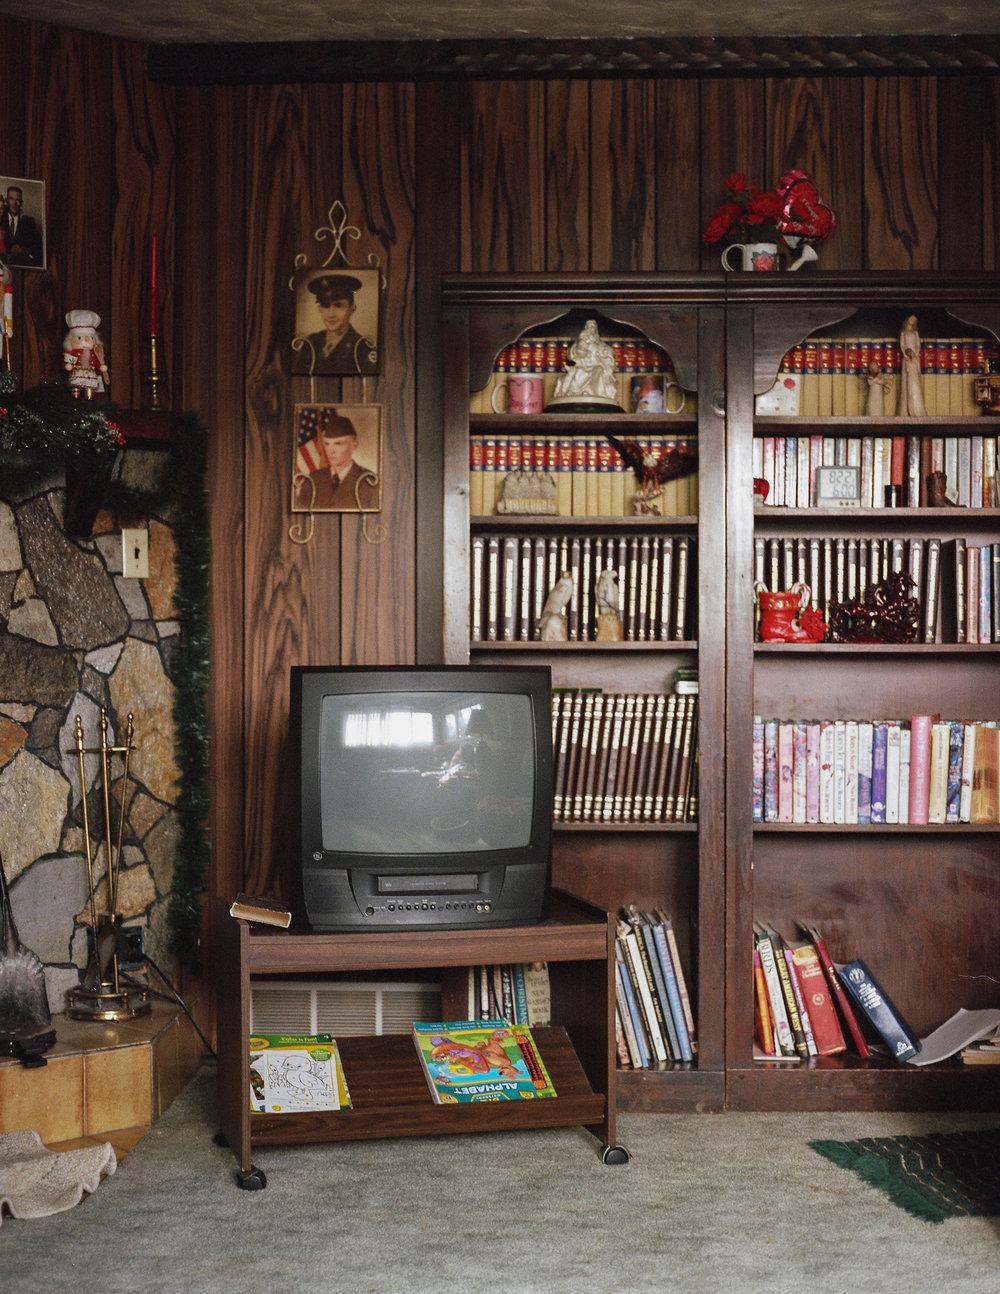 Interior of a home, Wanship, population 400 . December 2014.